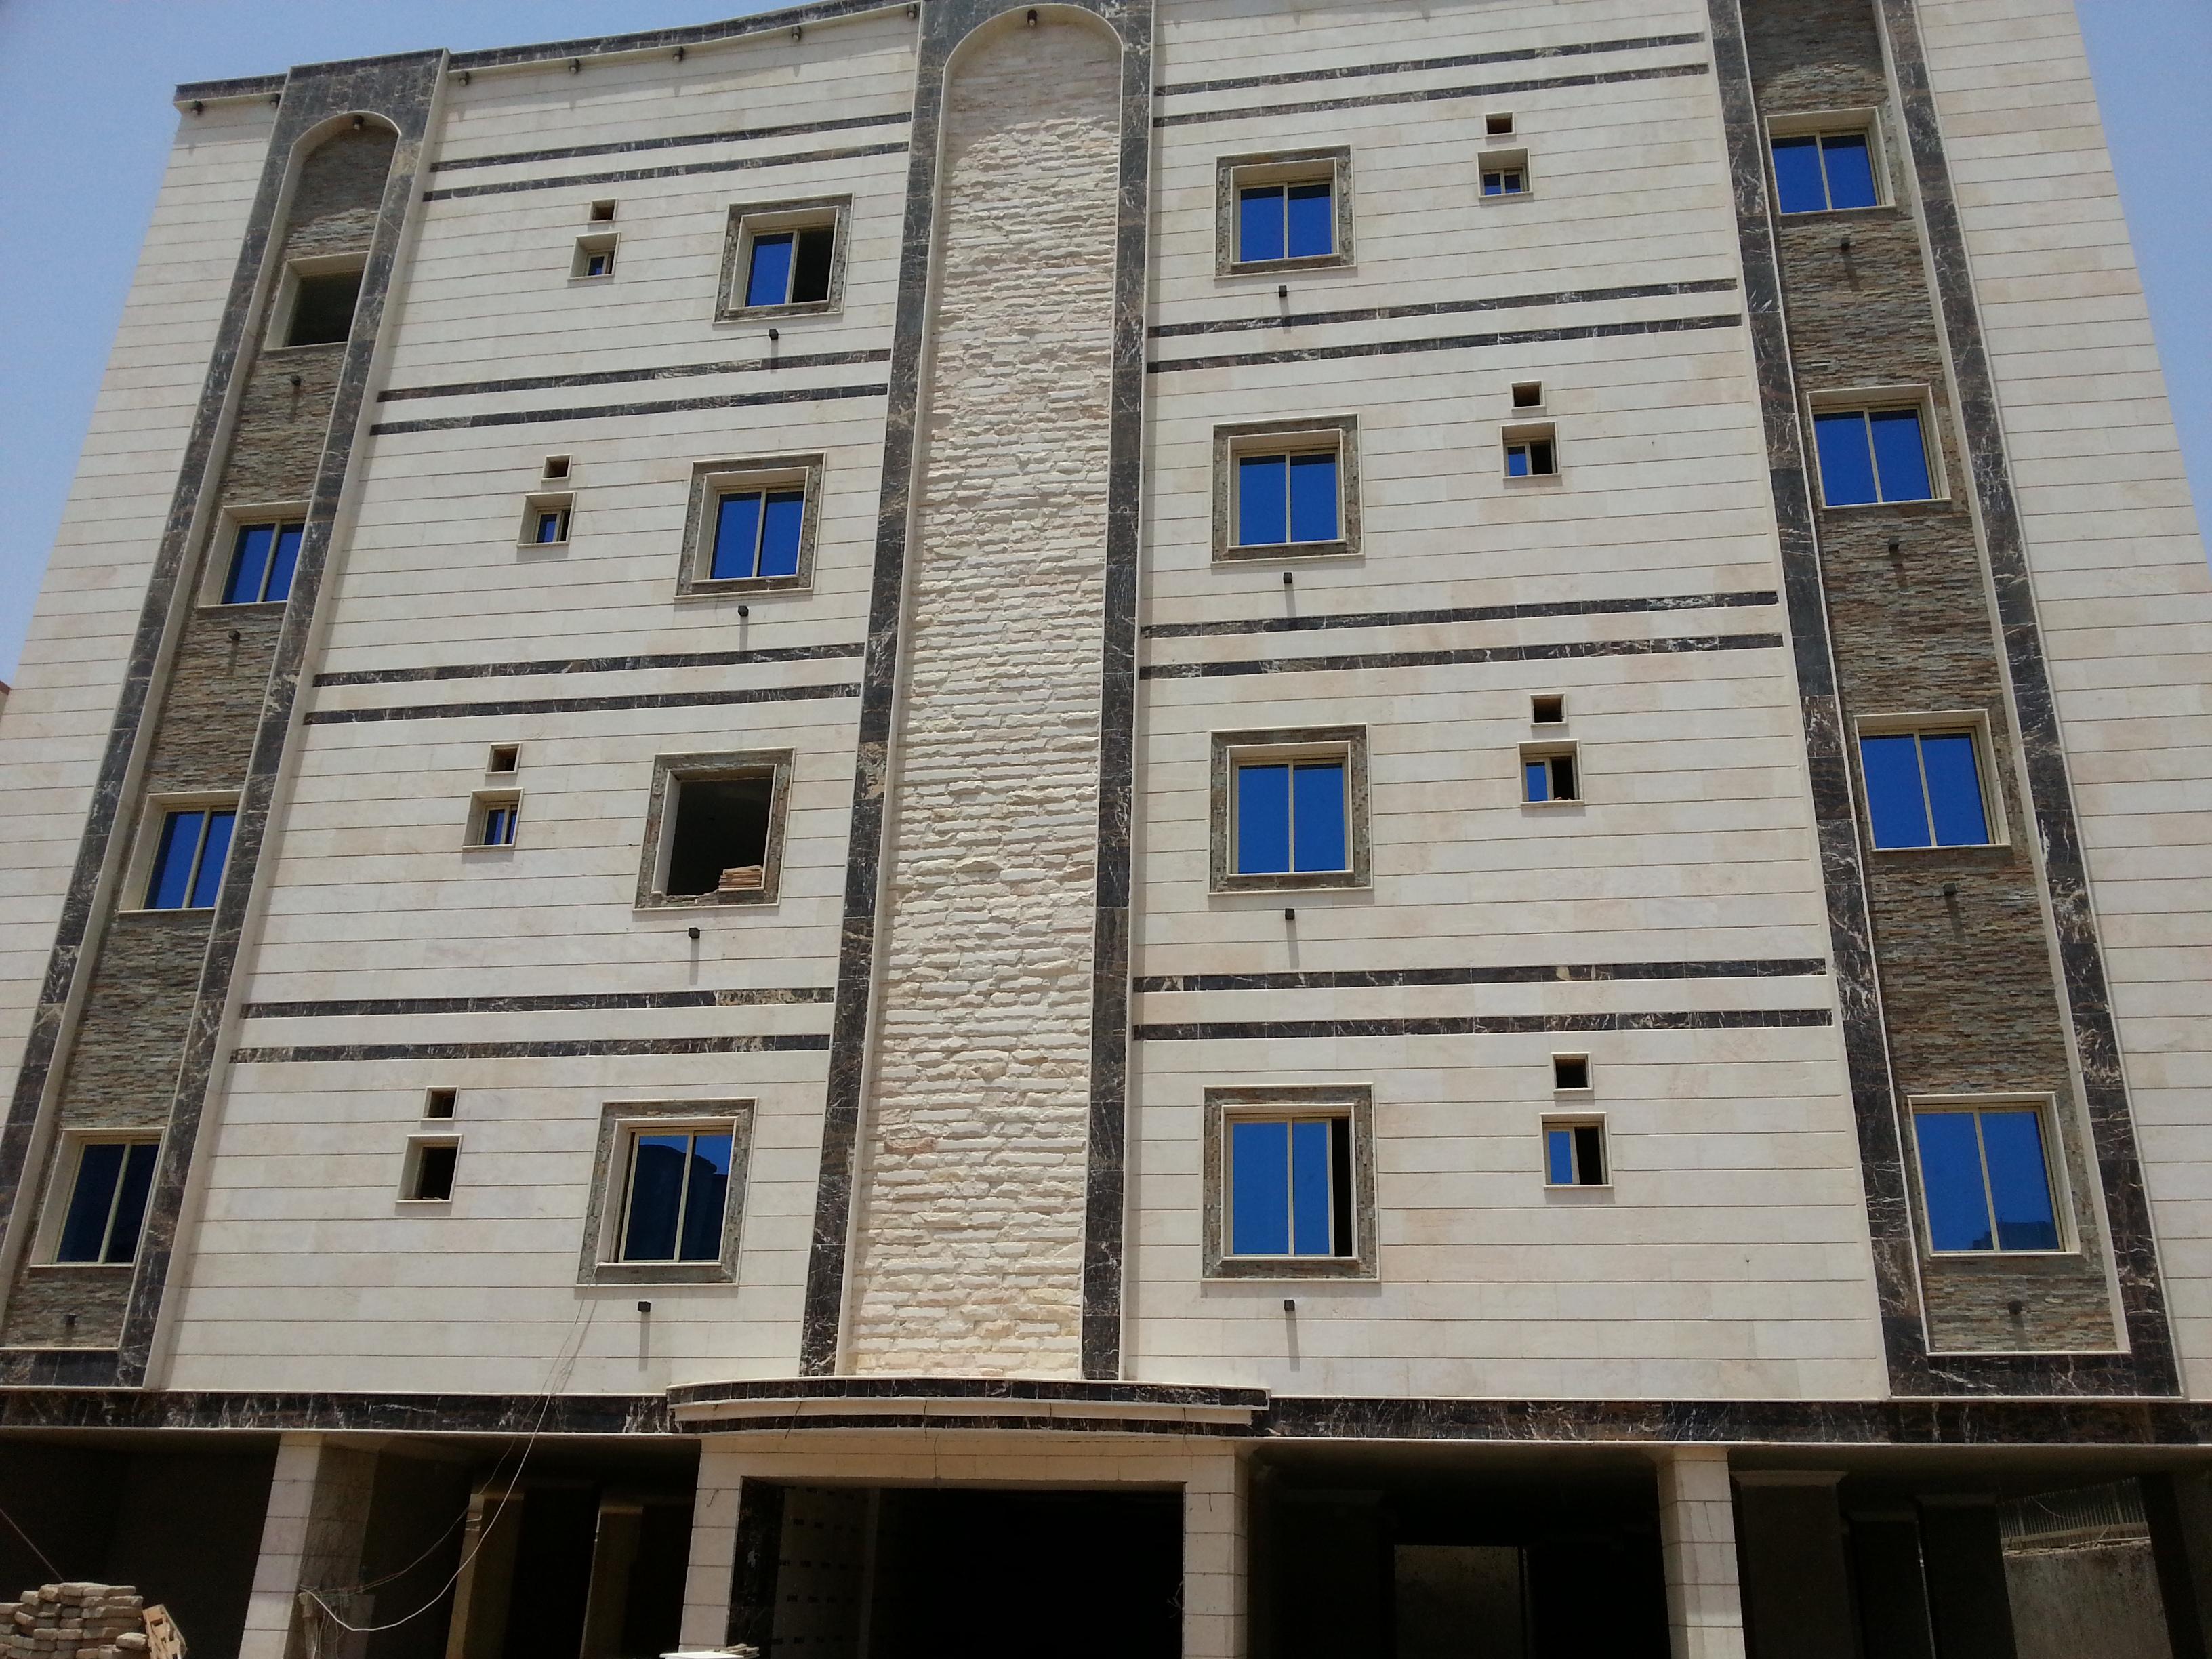 Building facades - Riyadh stone and